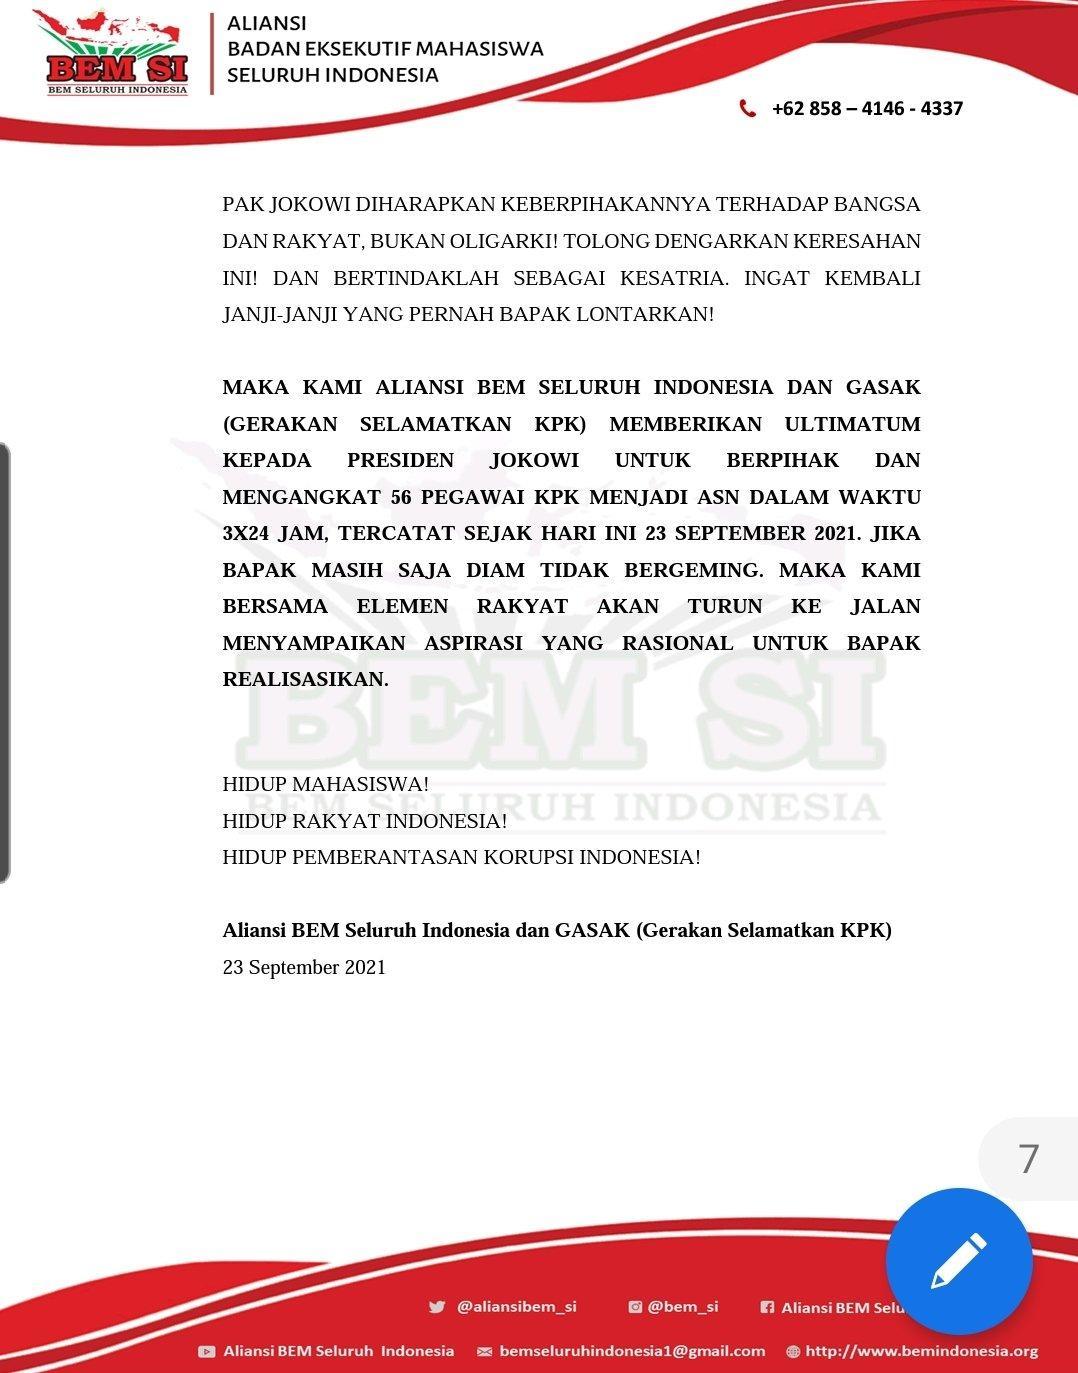 Surat ultimatum BEM SI ke Presiden Jokowi